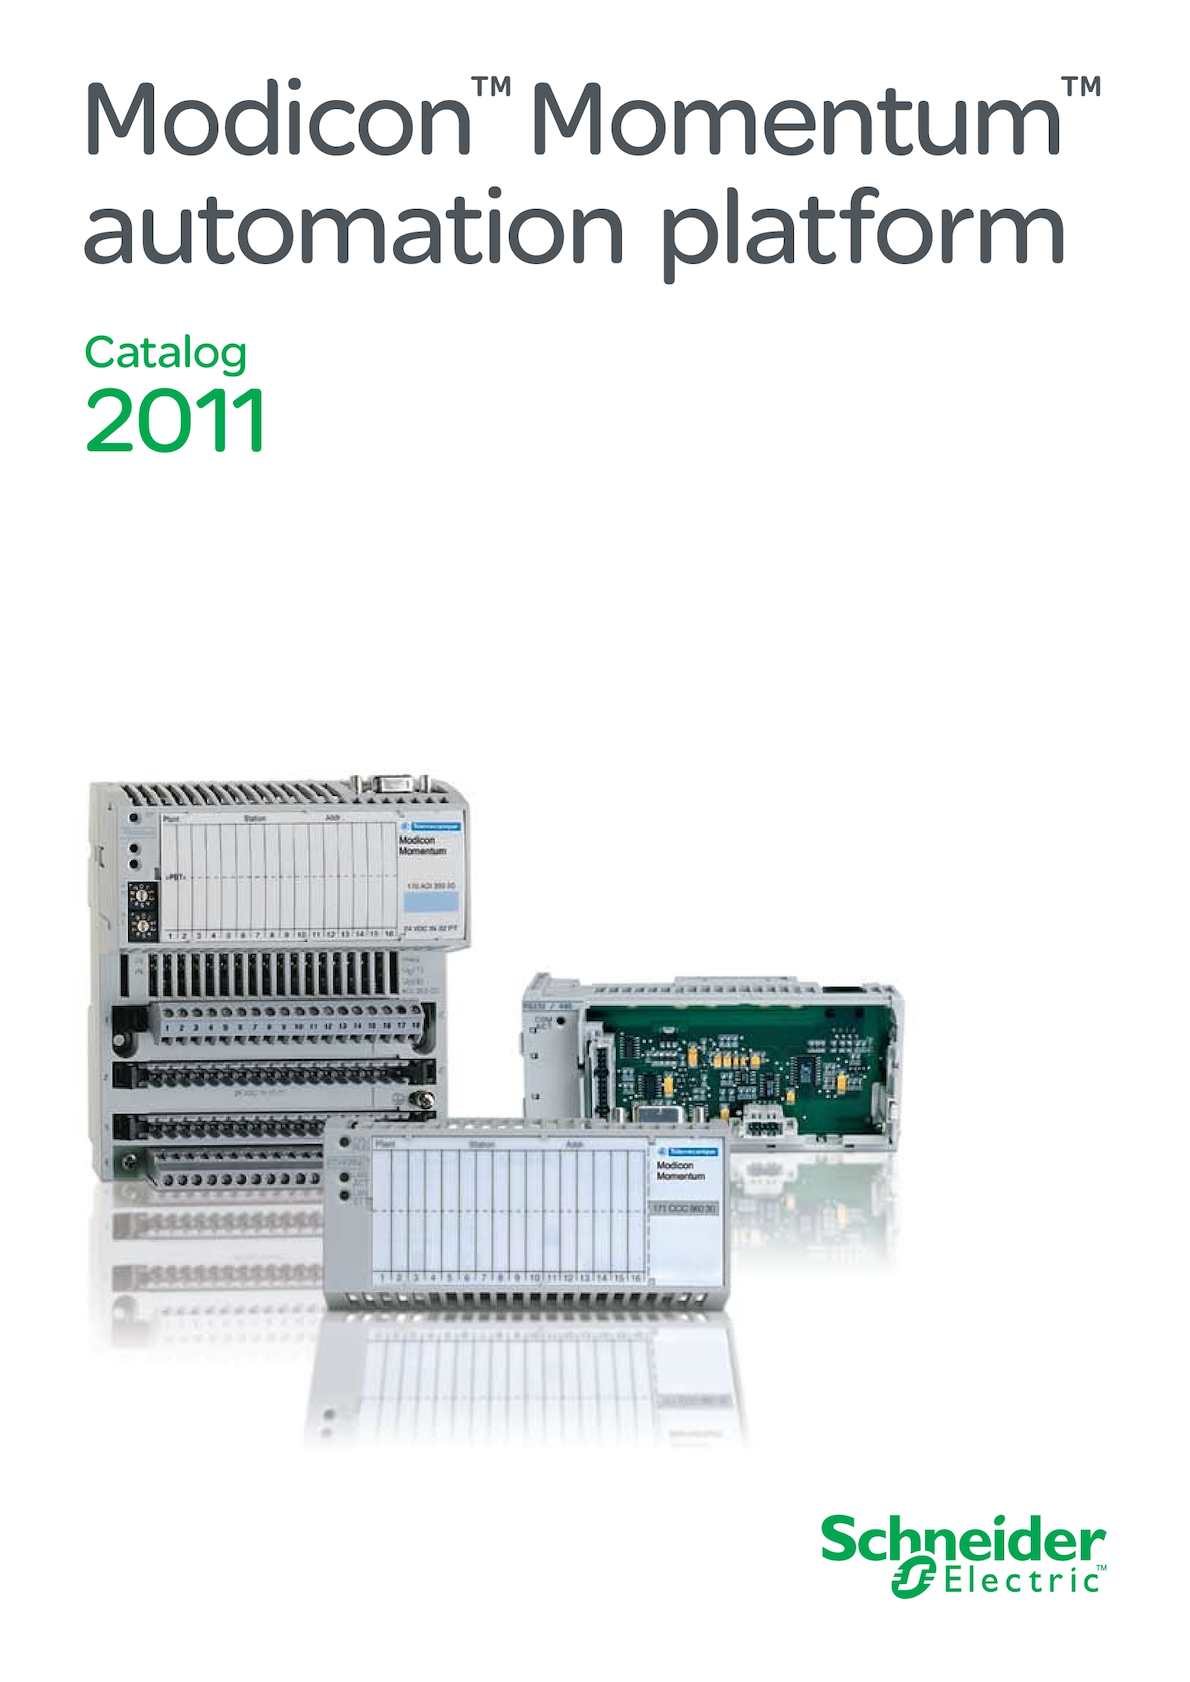 Calamo Catalogo Modicon Momentum Automation Platform Modbus Plus Wiring